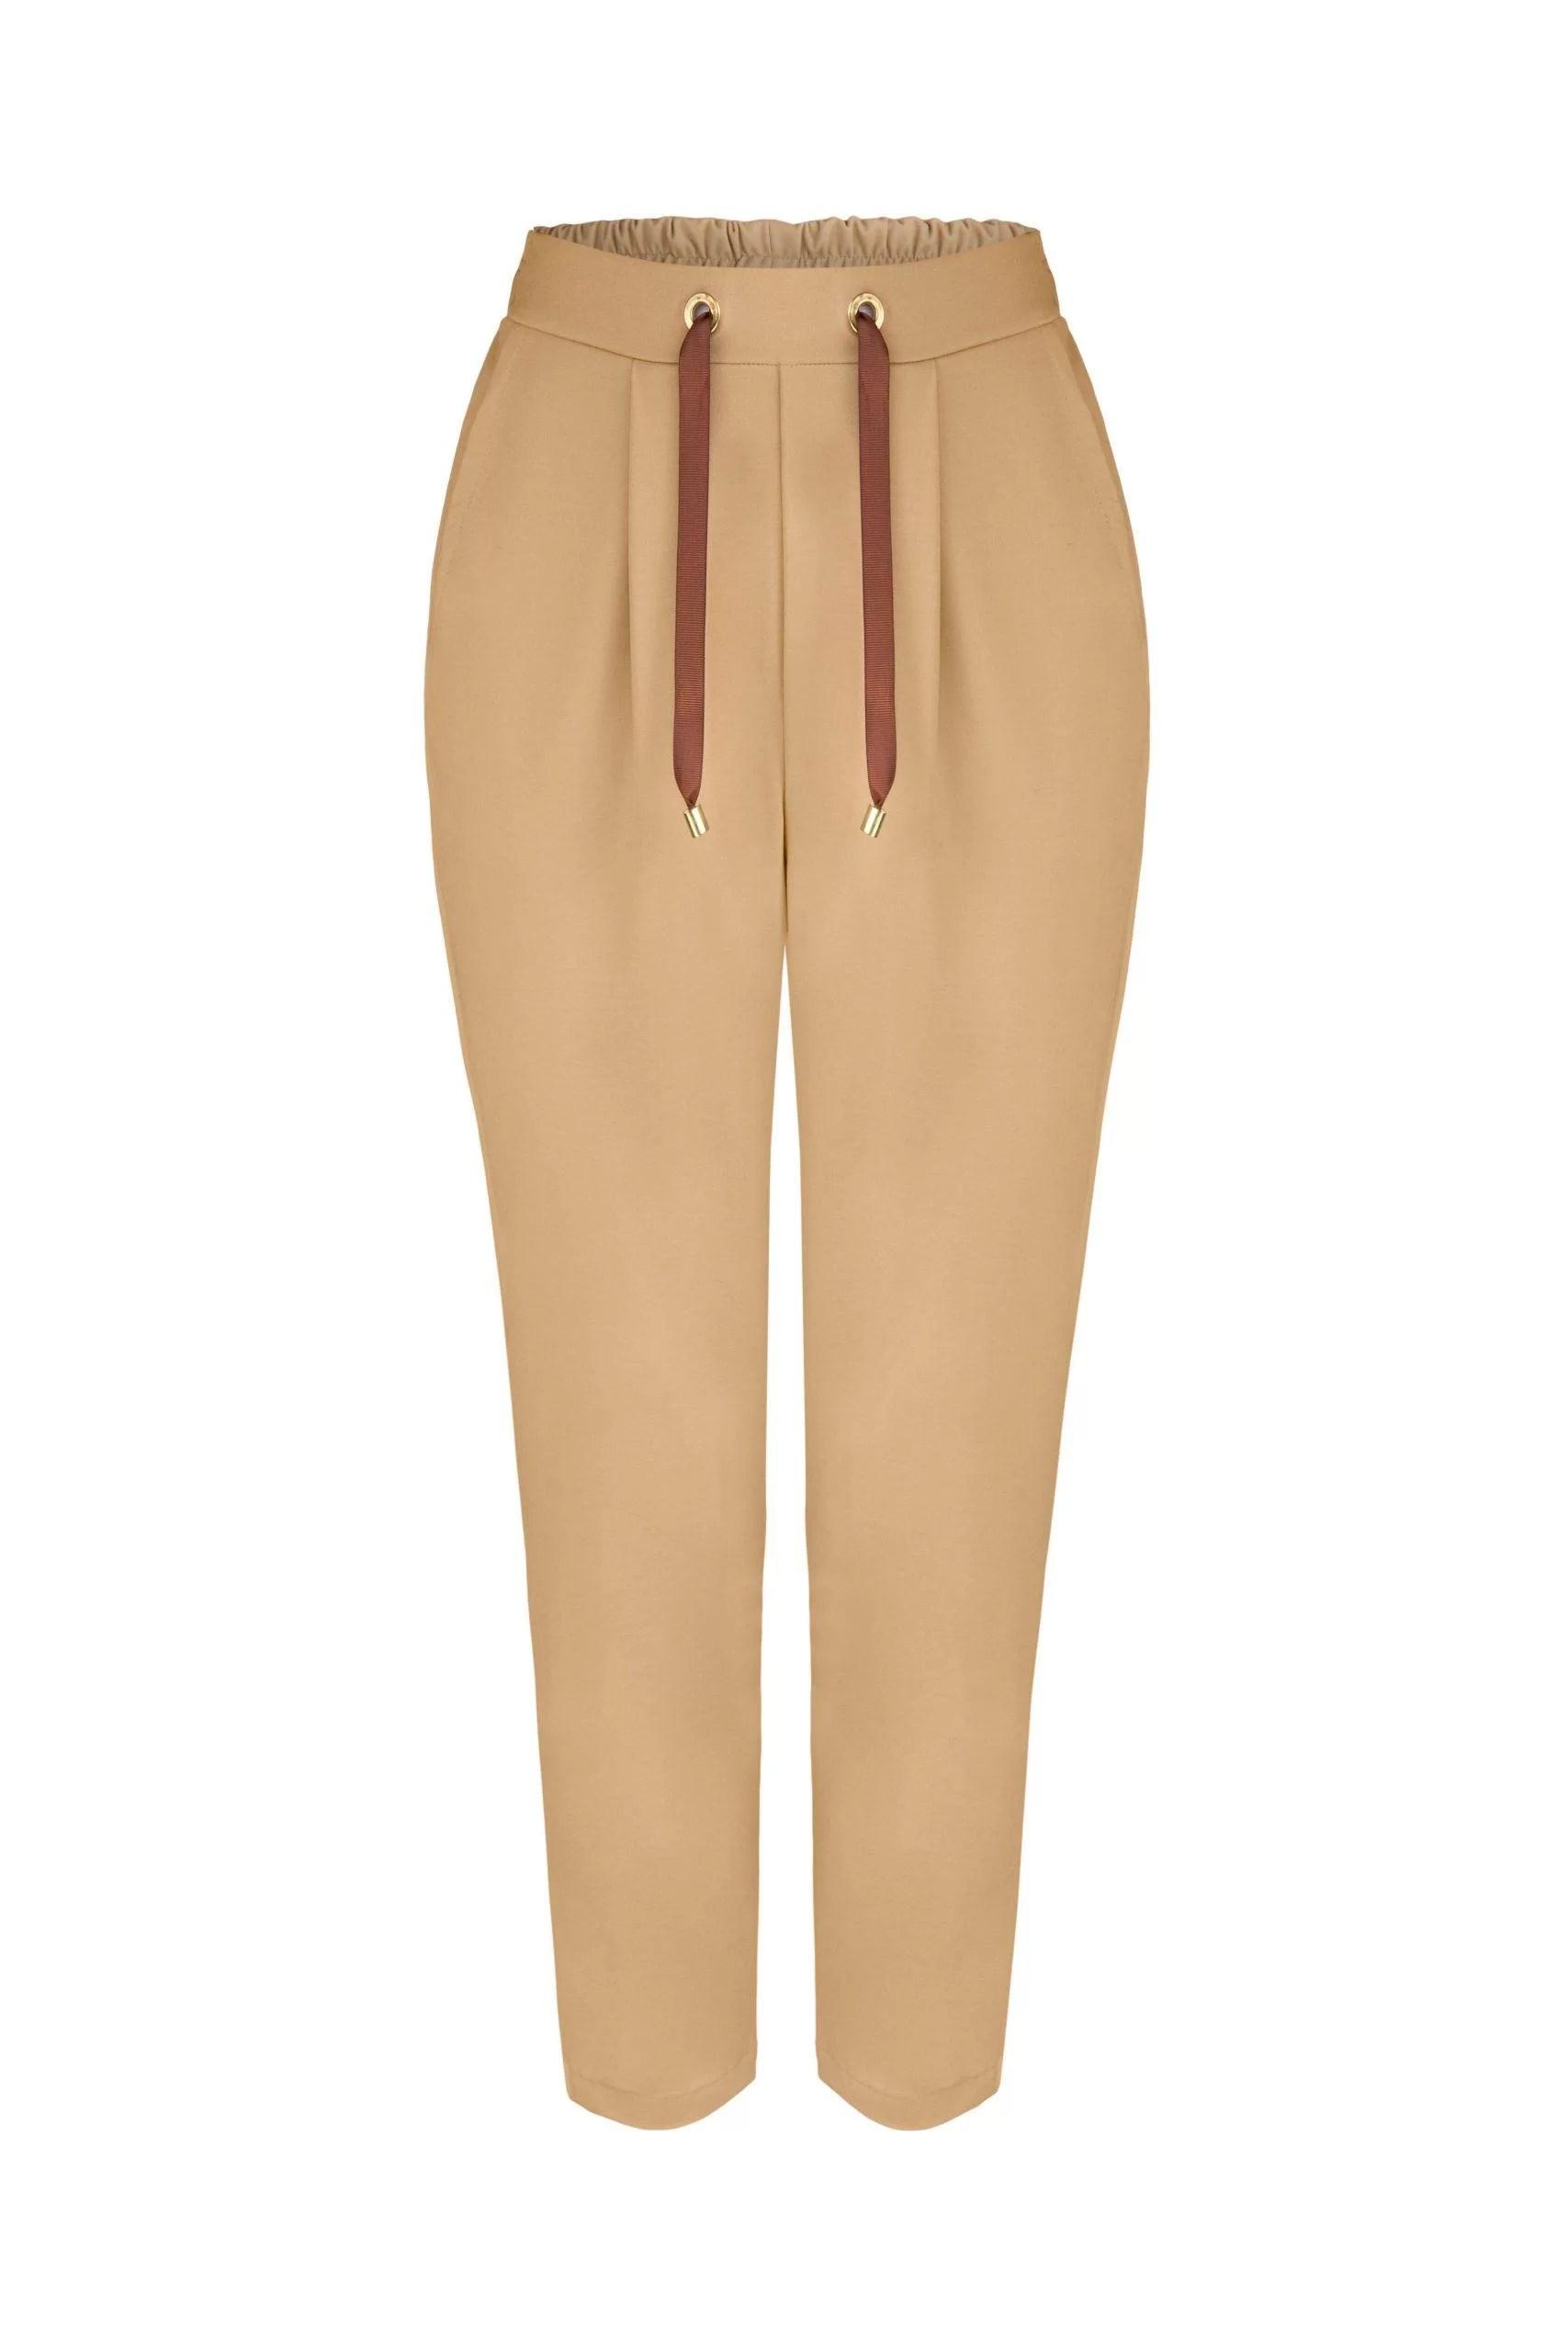 Spodnie Palermo Beżowe 36-50